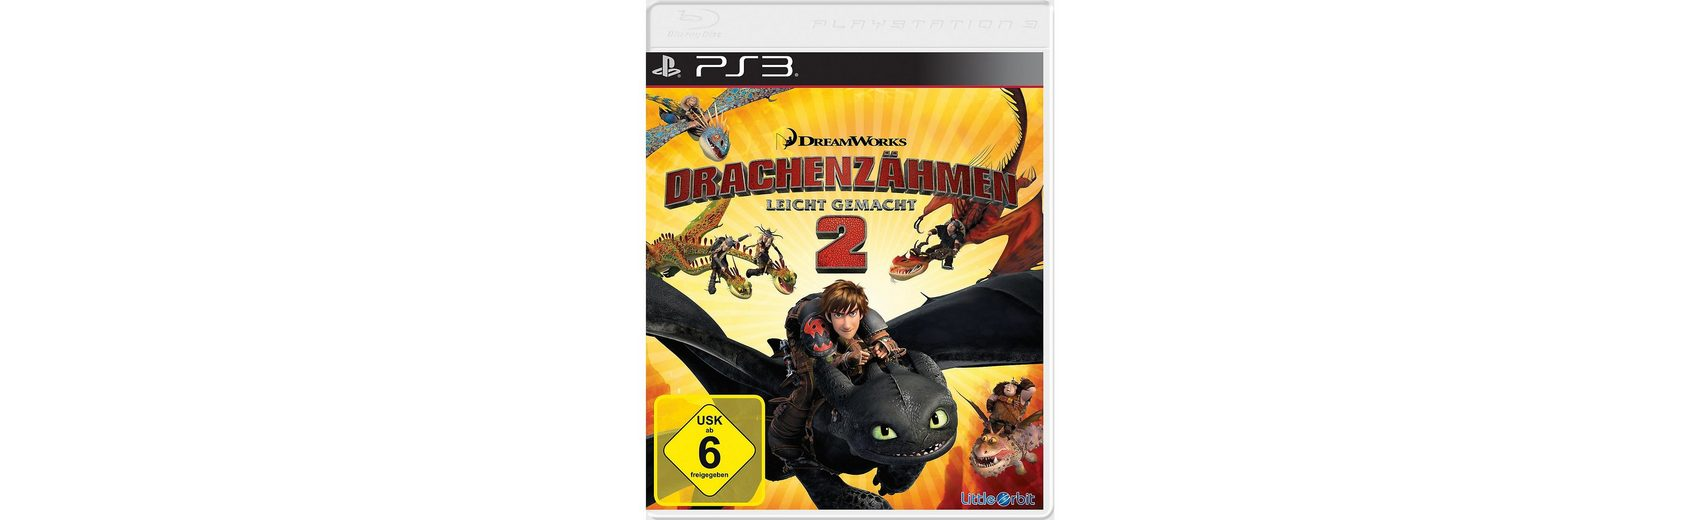 ak tronic PS3 Drachenzähmen leicht gemacht 2